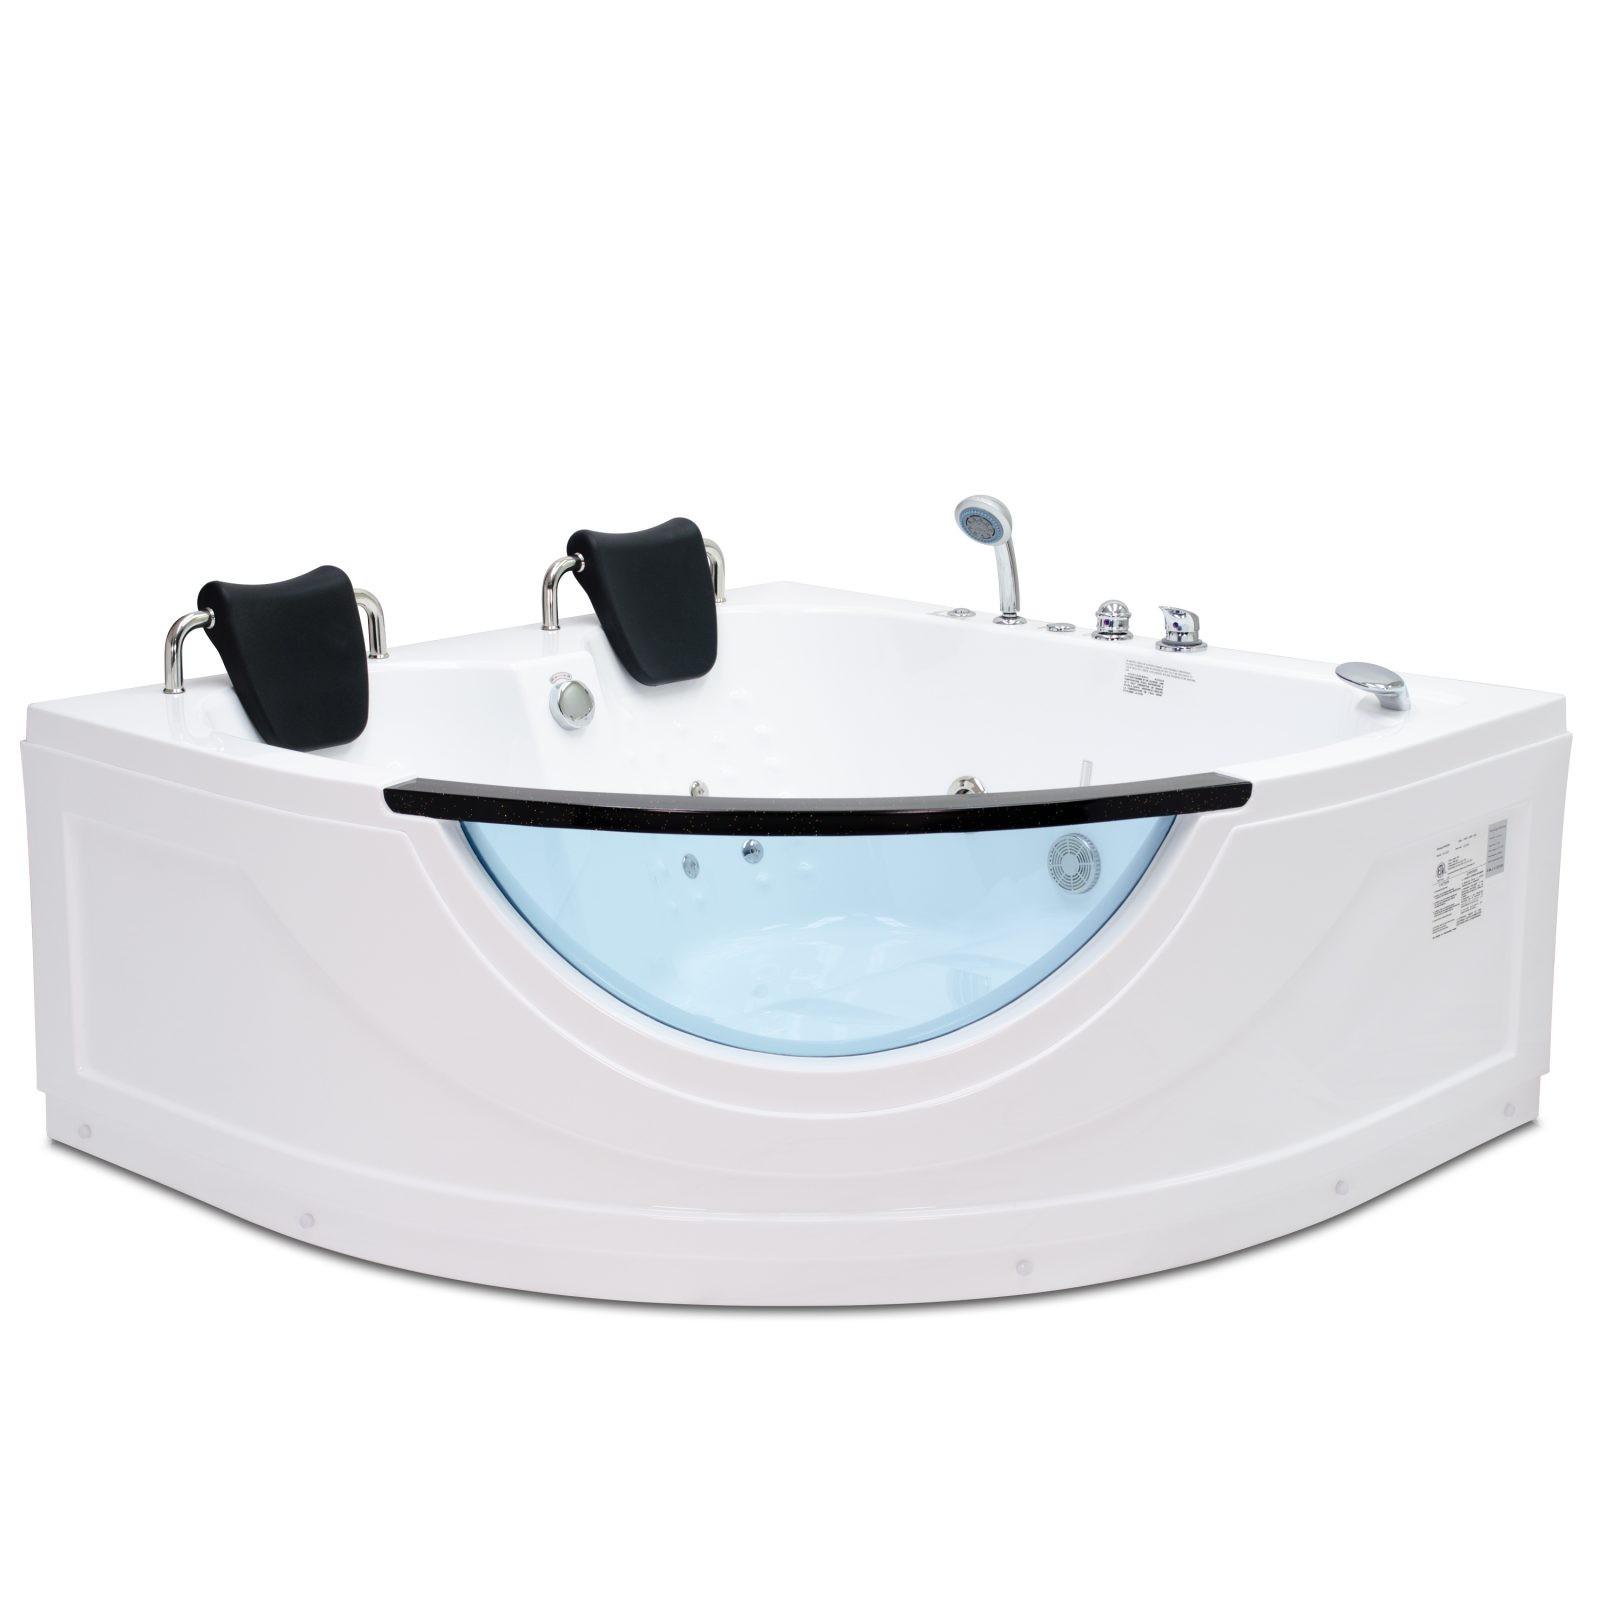 Whirlpool Chelsea Massage Bathtubs Shop Online Now